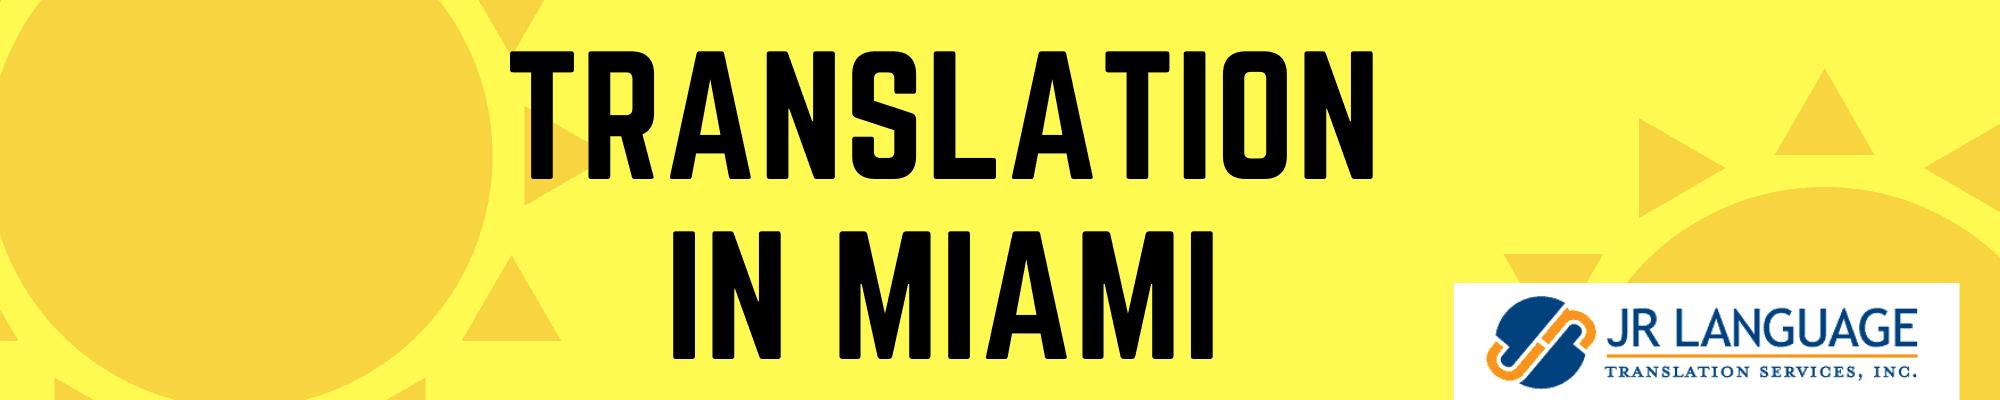 Professional translation Services in Miami